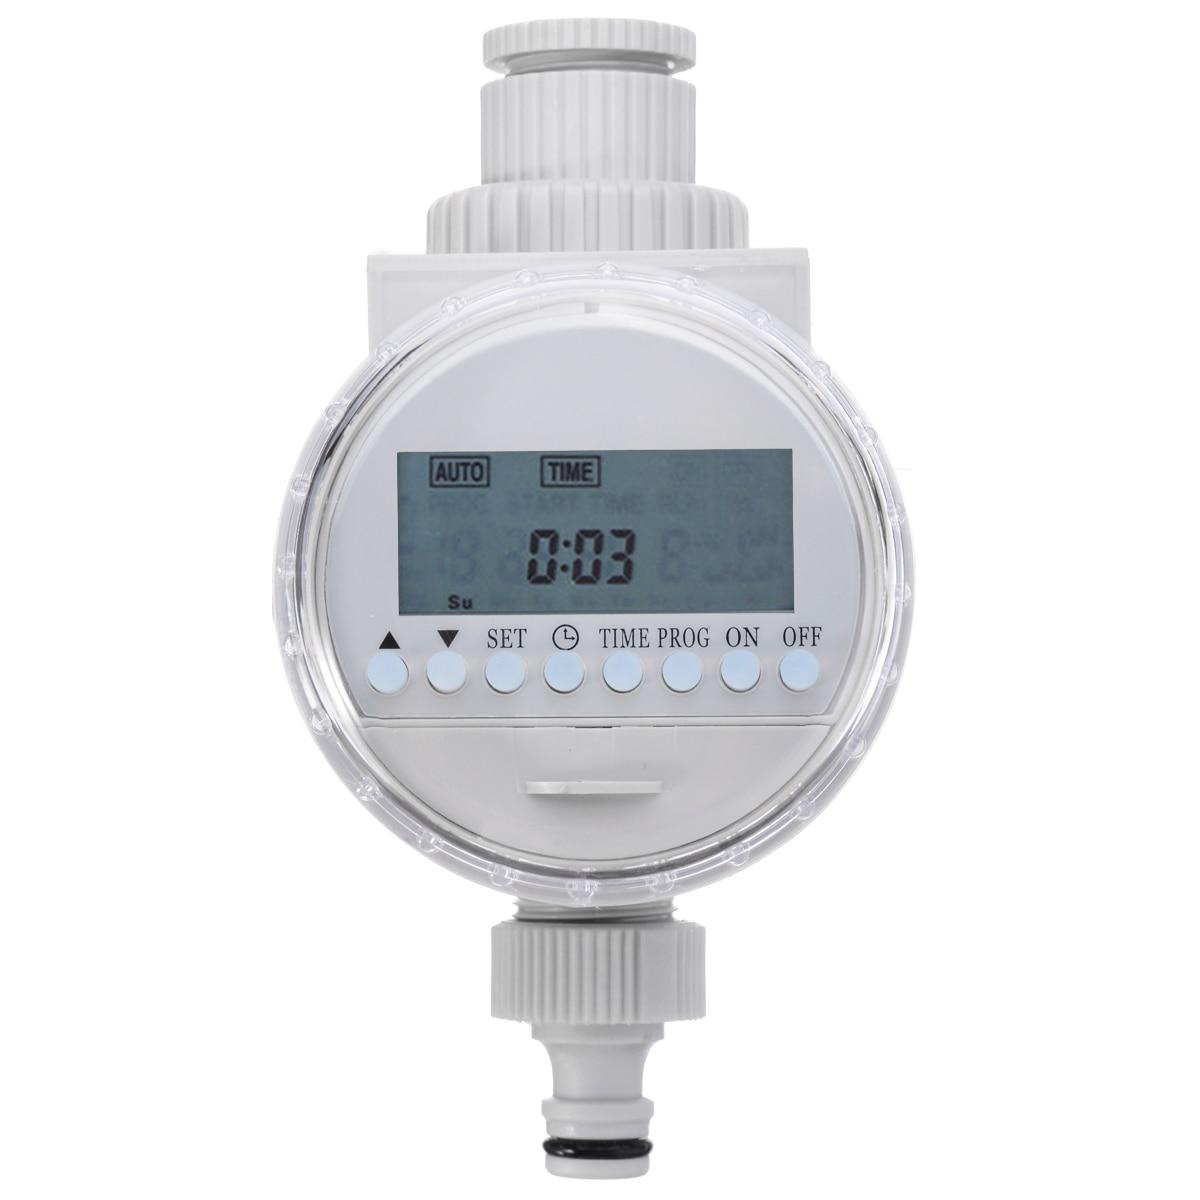 Mayitr Solar Digital LCD Auto Watering Timer Water Saving Irrigation Controller Outdoor Garden Water Timers|Garden Water Timers| |  - title=